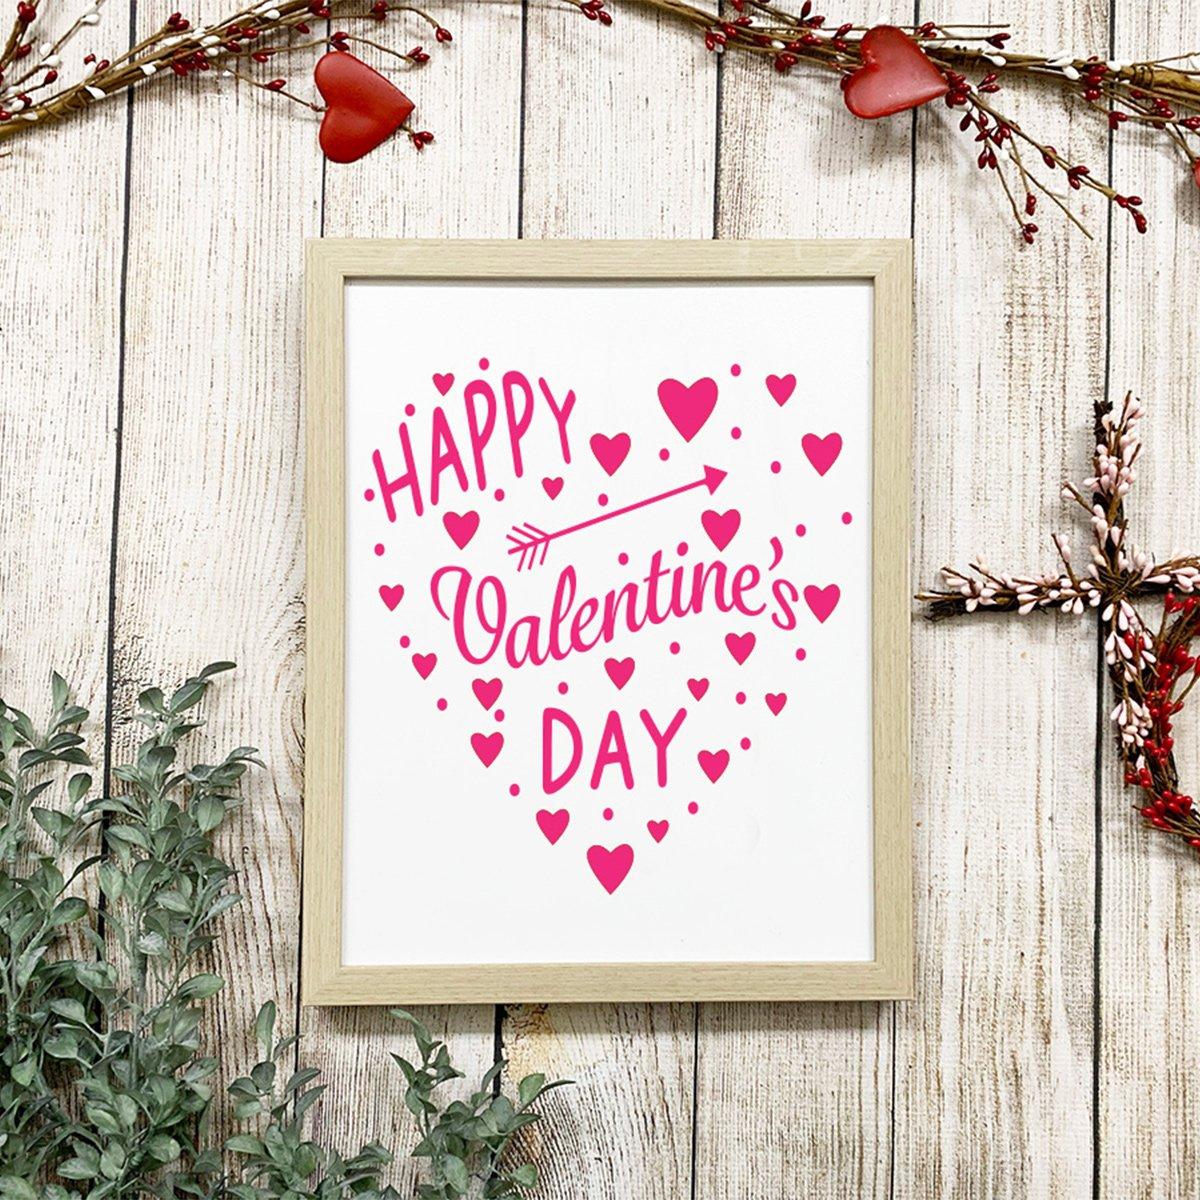 Valentine's Day Heart SVG Styled